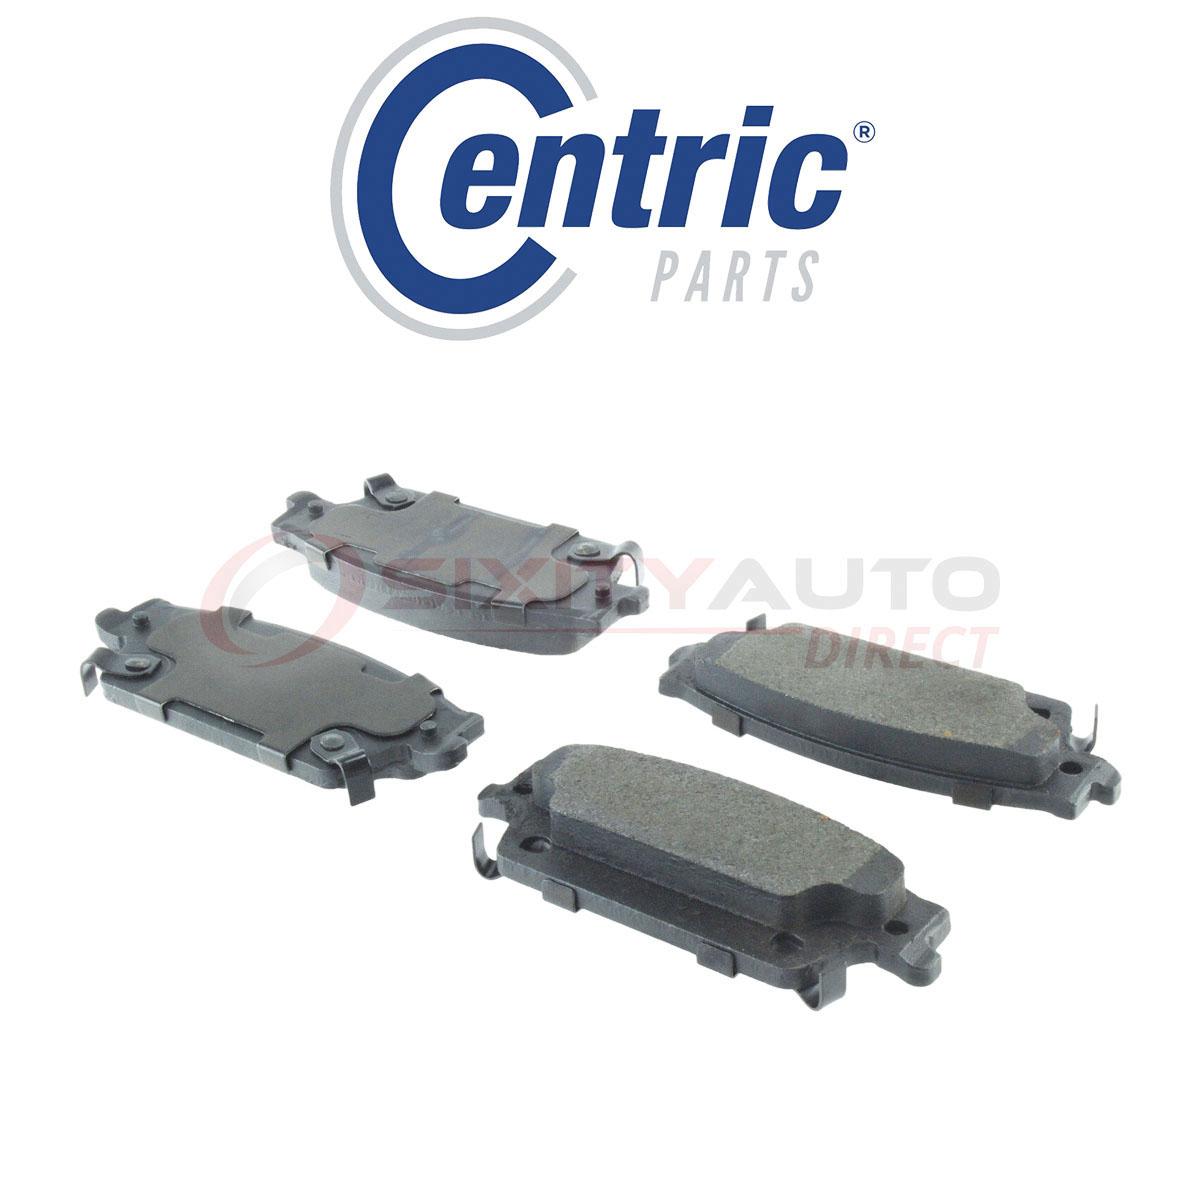 Centric Parts 104.05990 104 Series Semi Metallic Standard Brake Pad